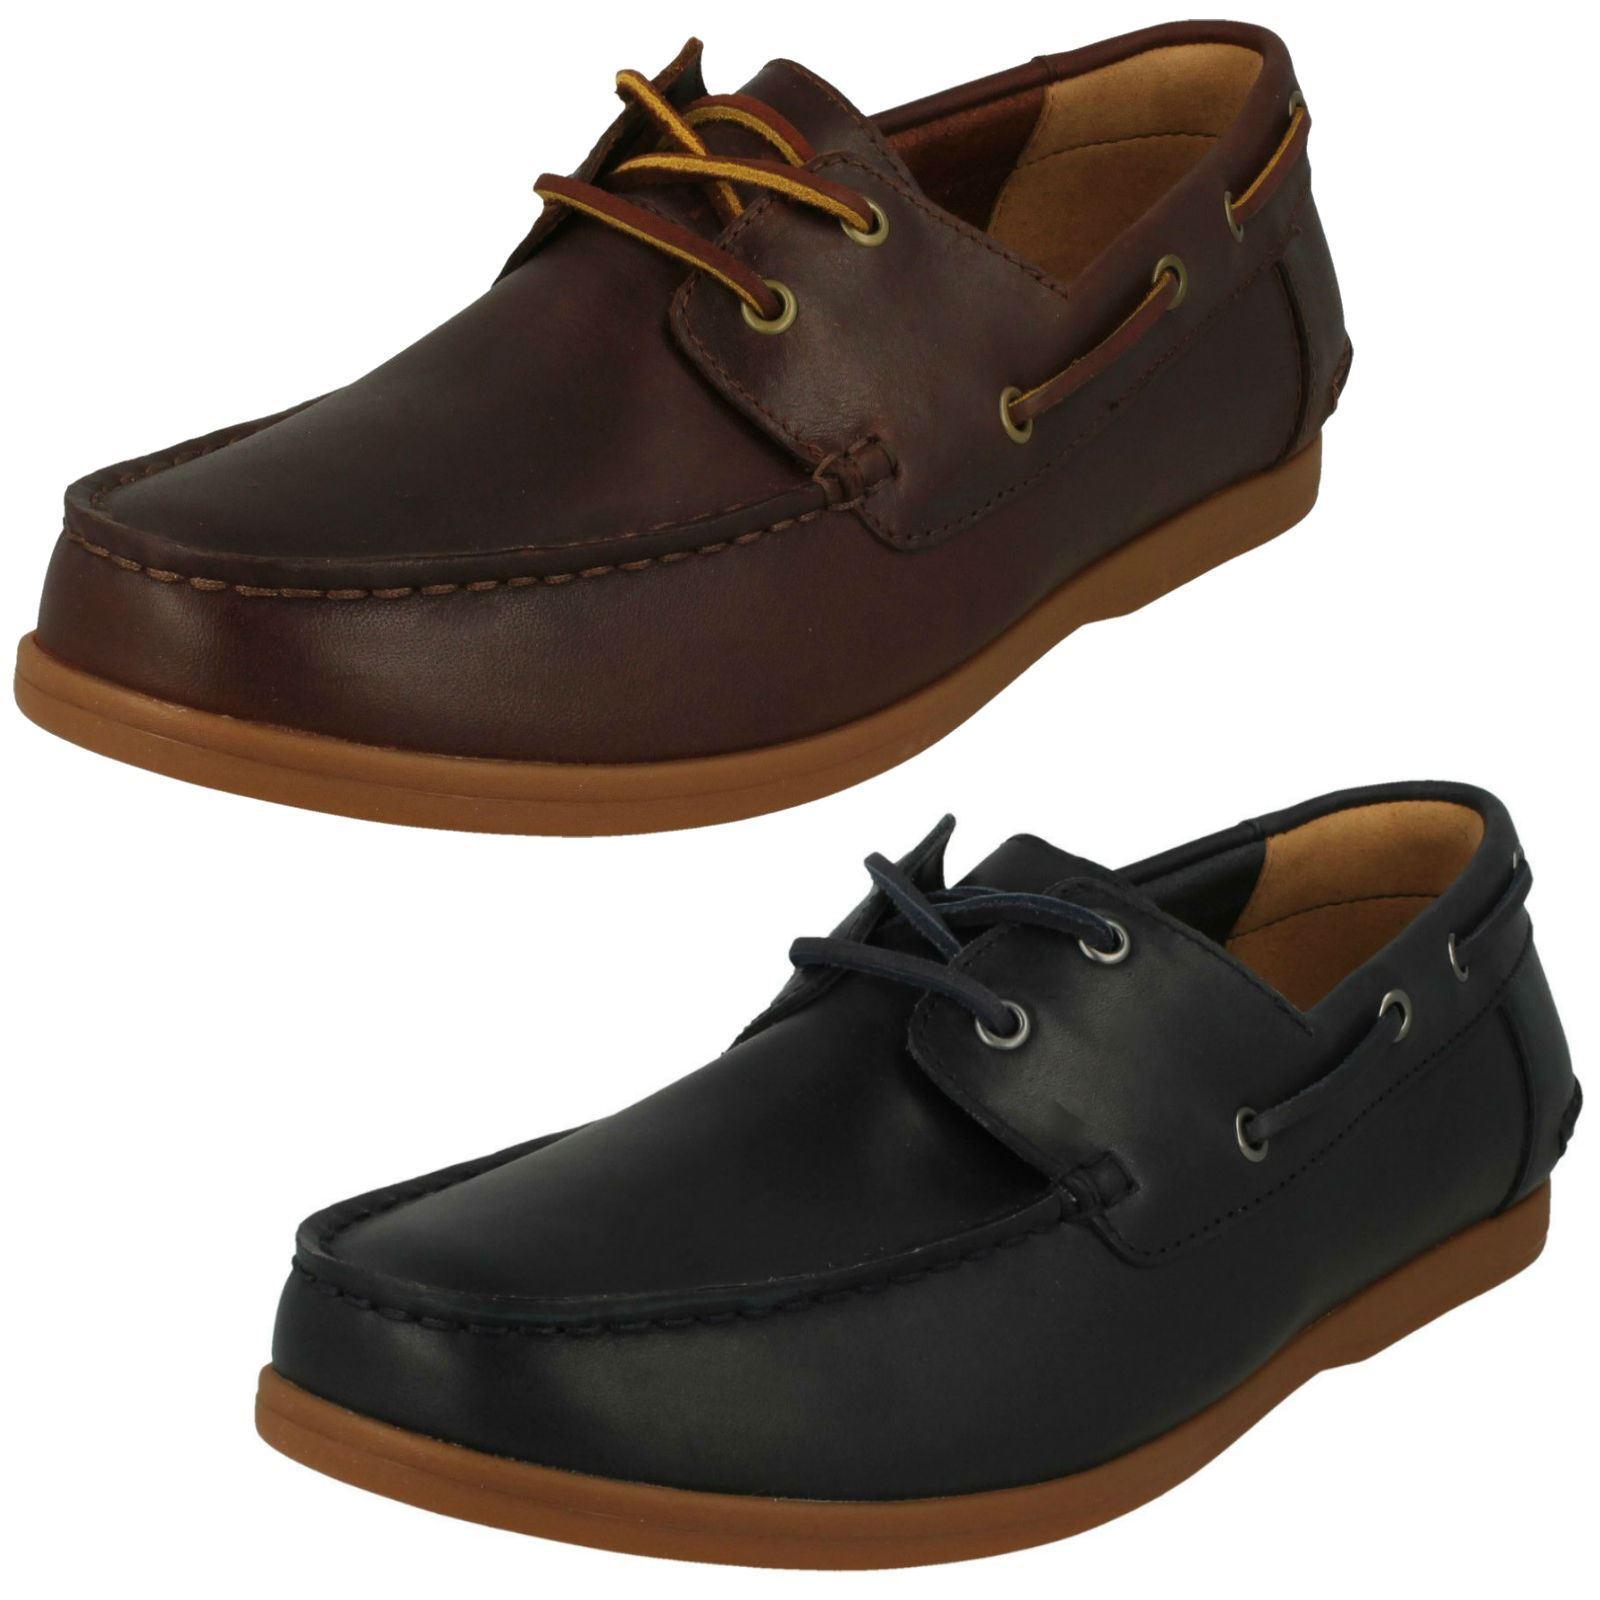 Clarks Mens Lace Up Boat Shoes - Morven Sail